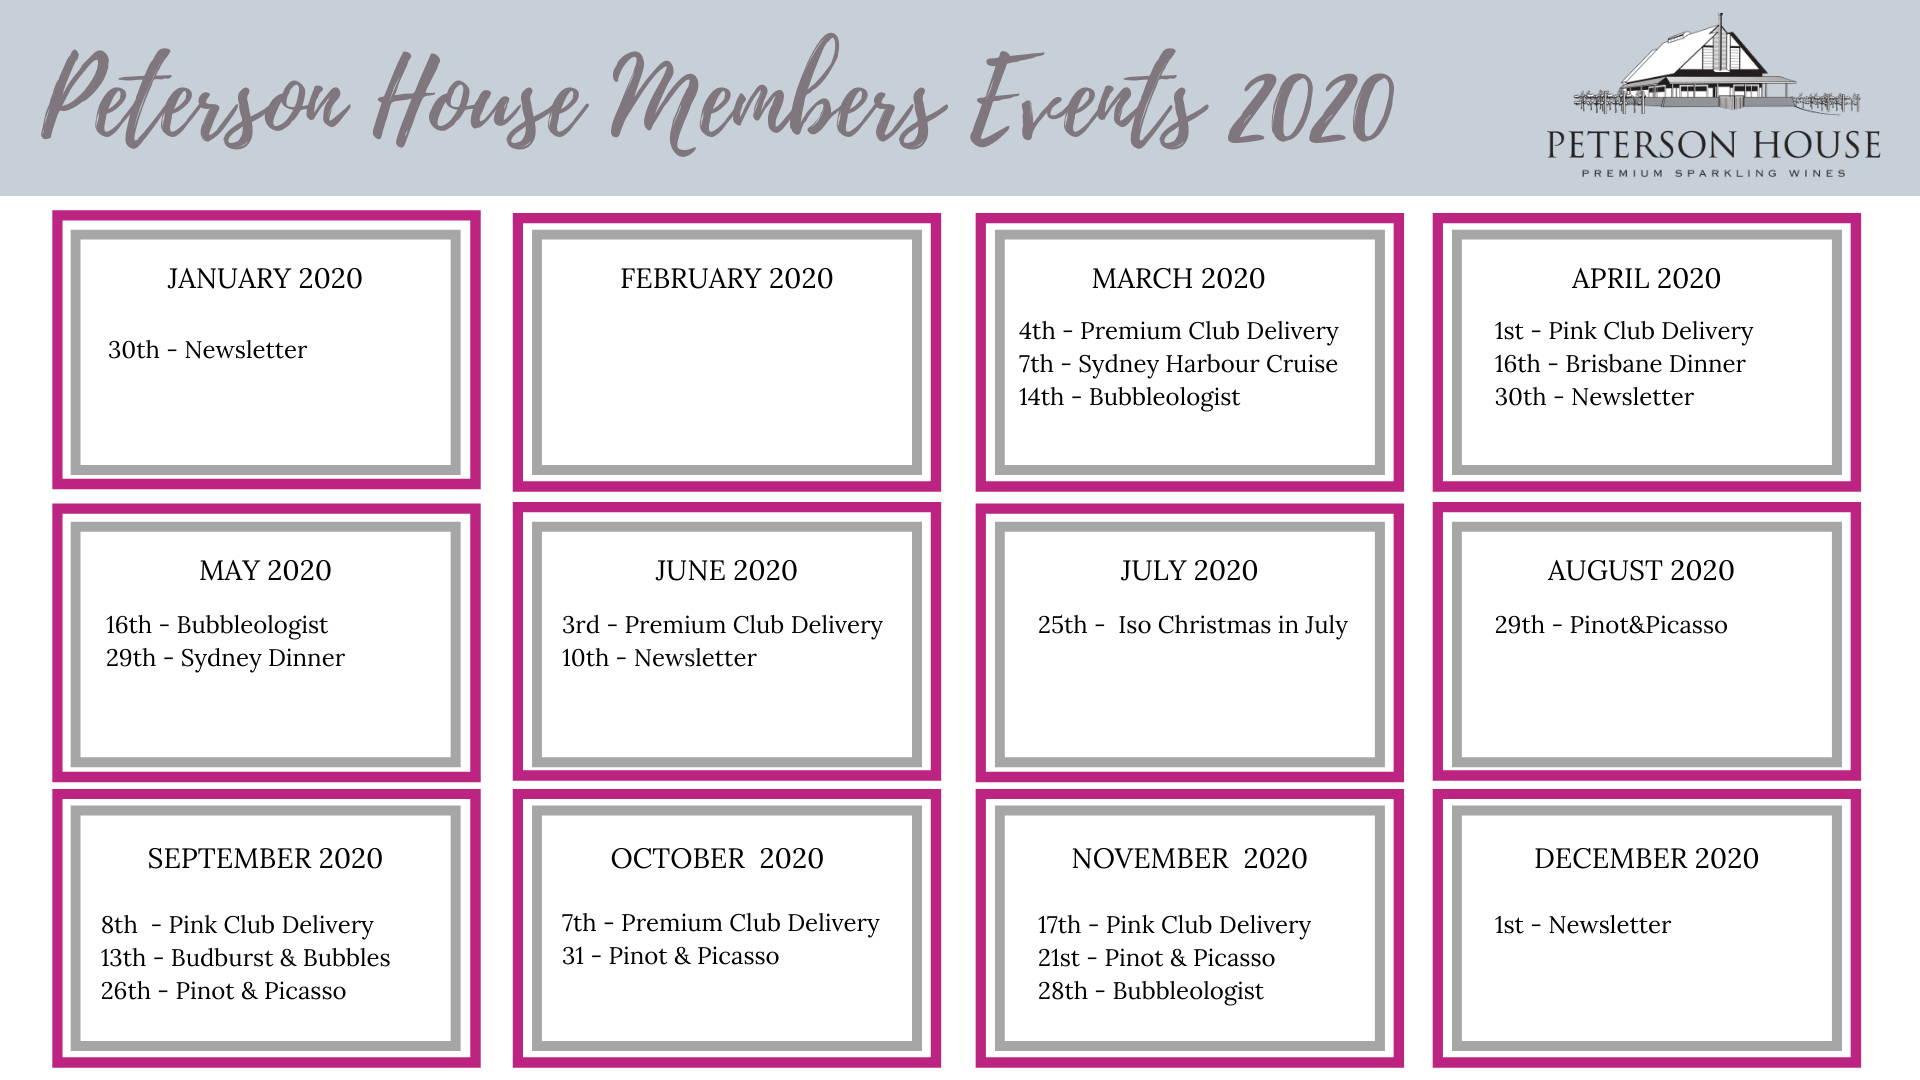 Peterson House Wine Club Members Events Calendar 2020